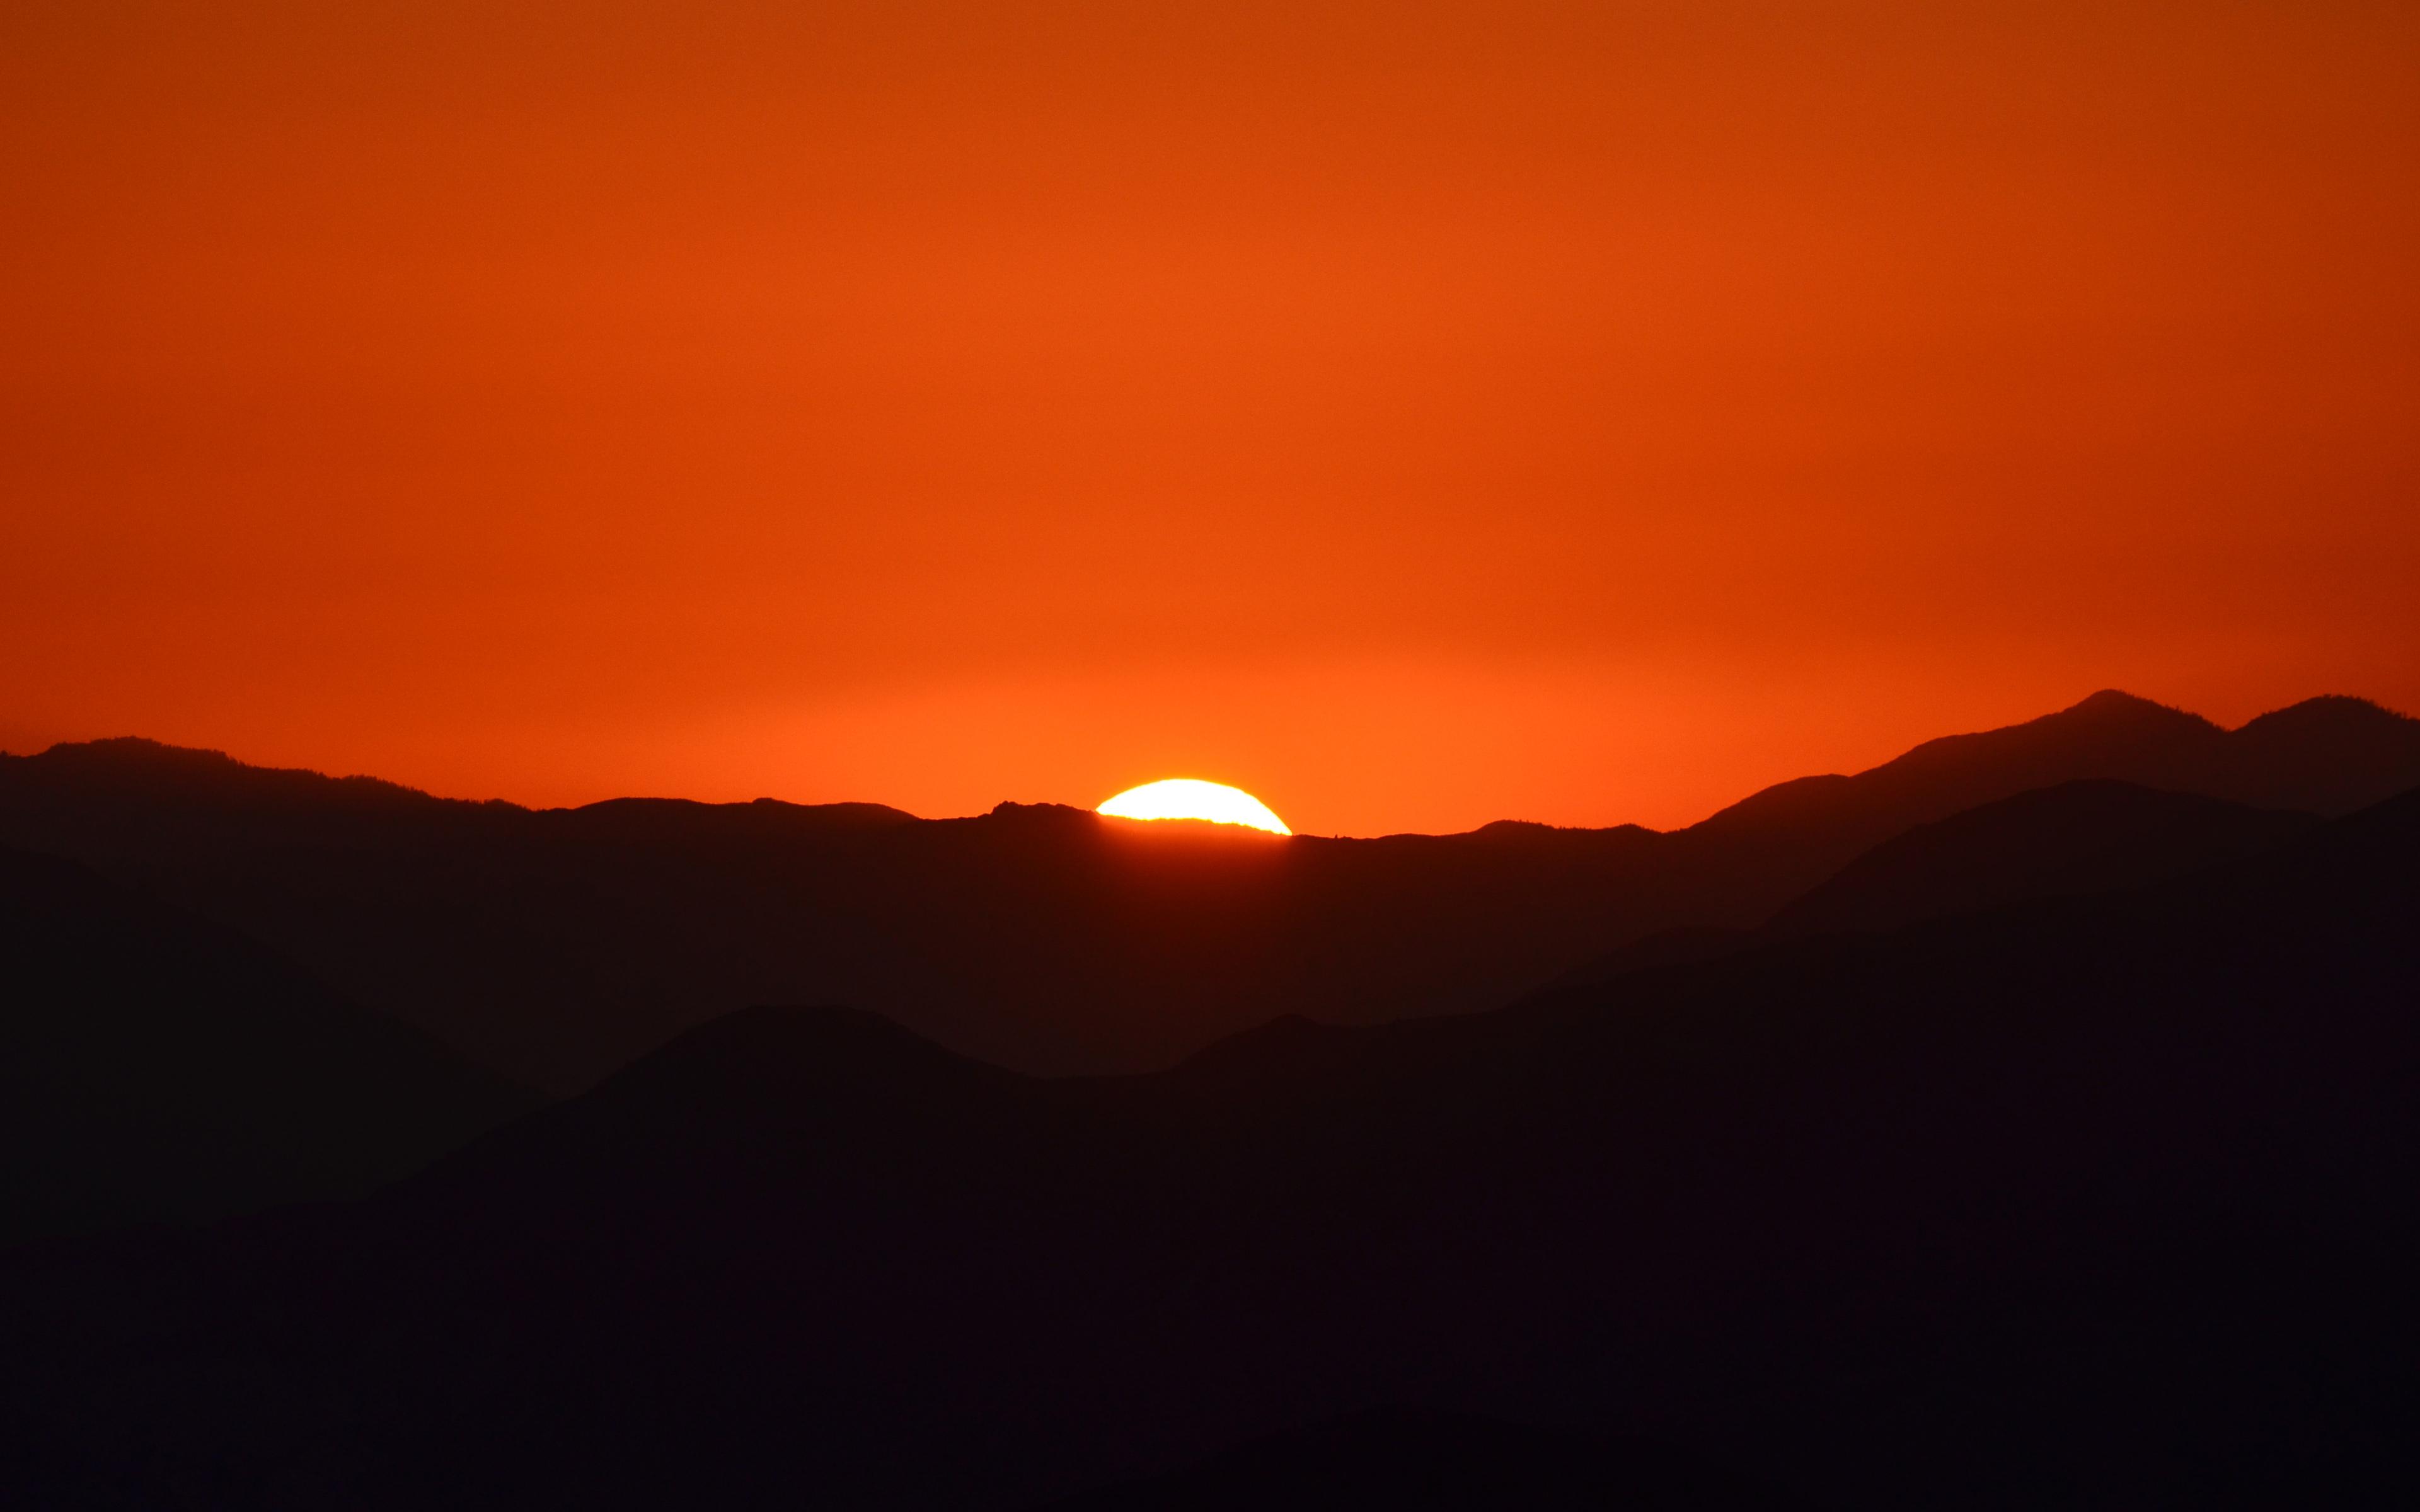 Angeles Sunset Wallpaper by Terry Majamaki